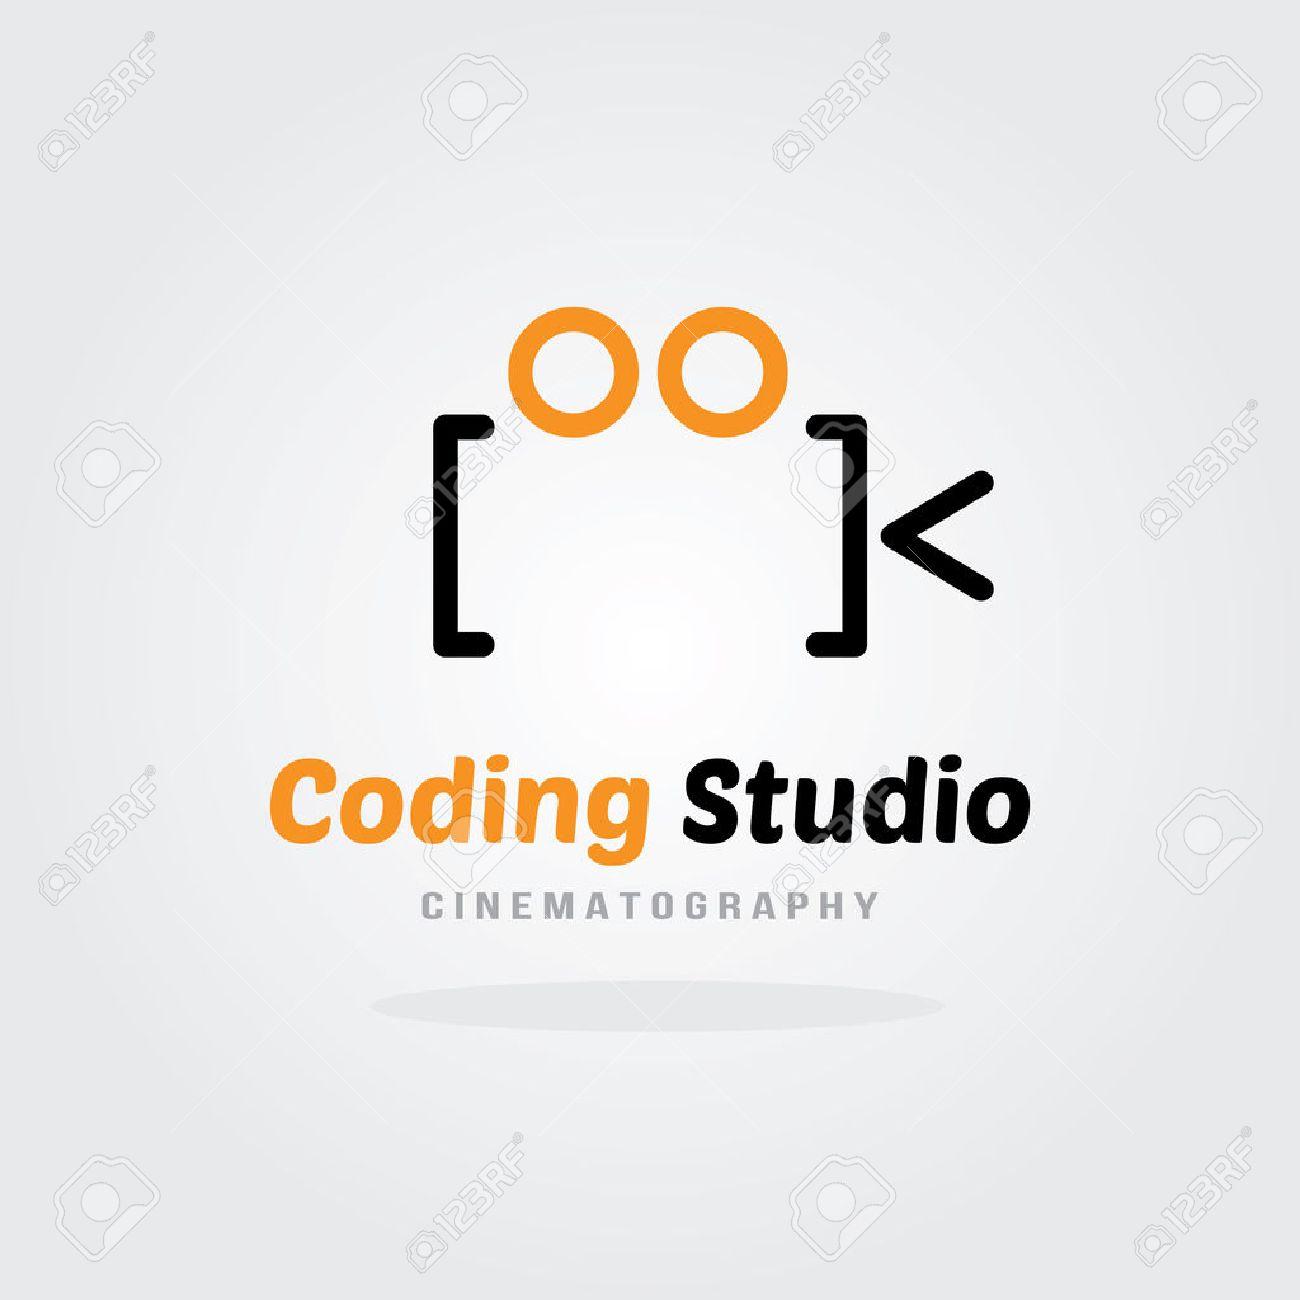 coding studio logo design template video camera concept software company logo template design